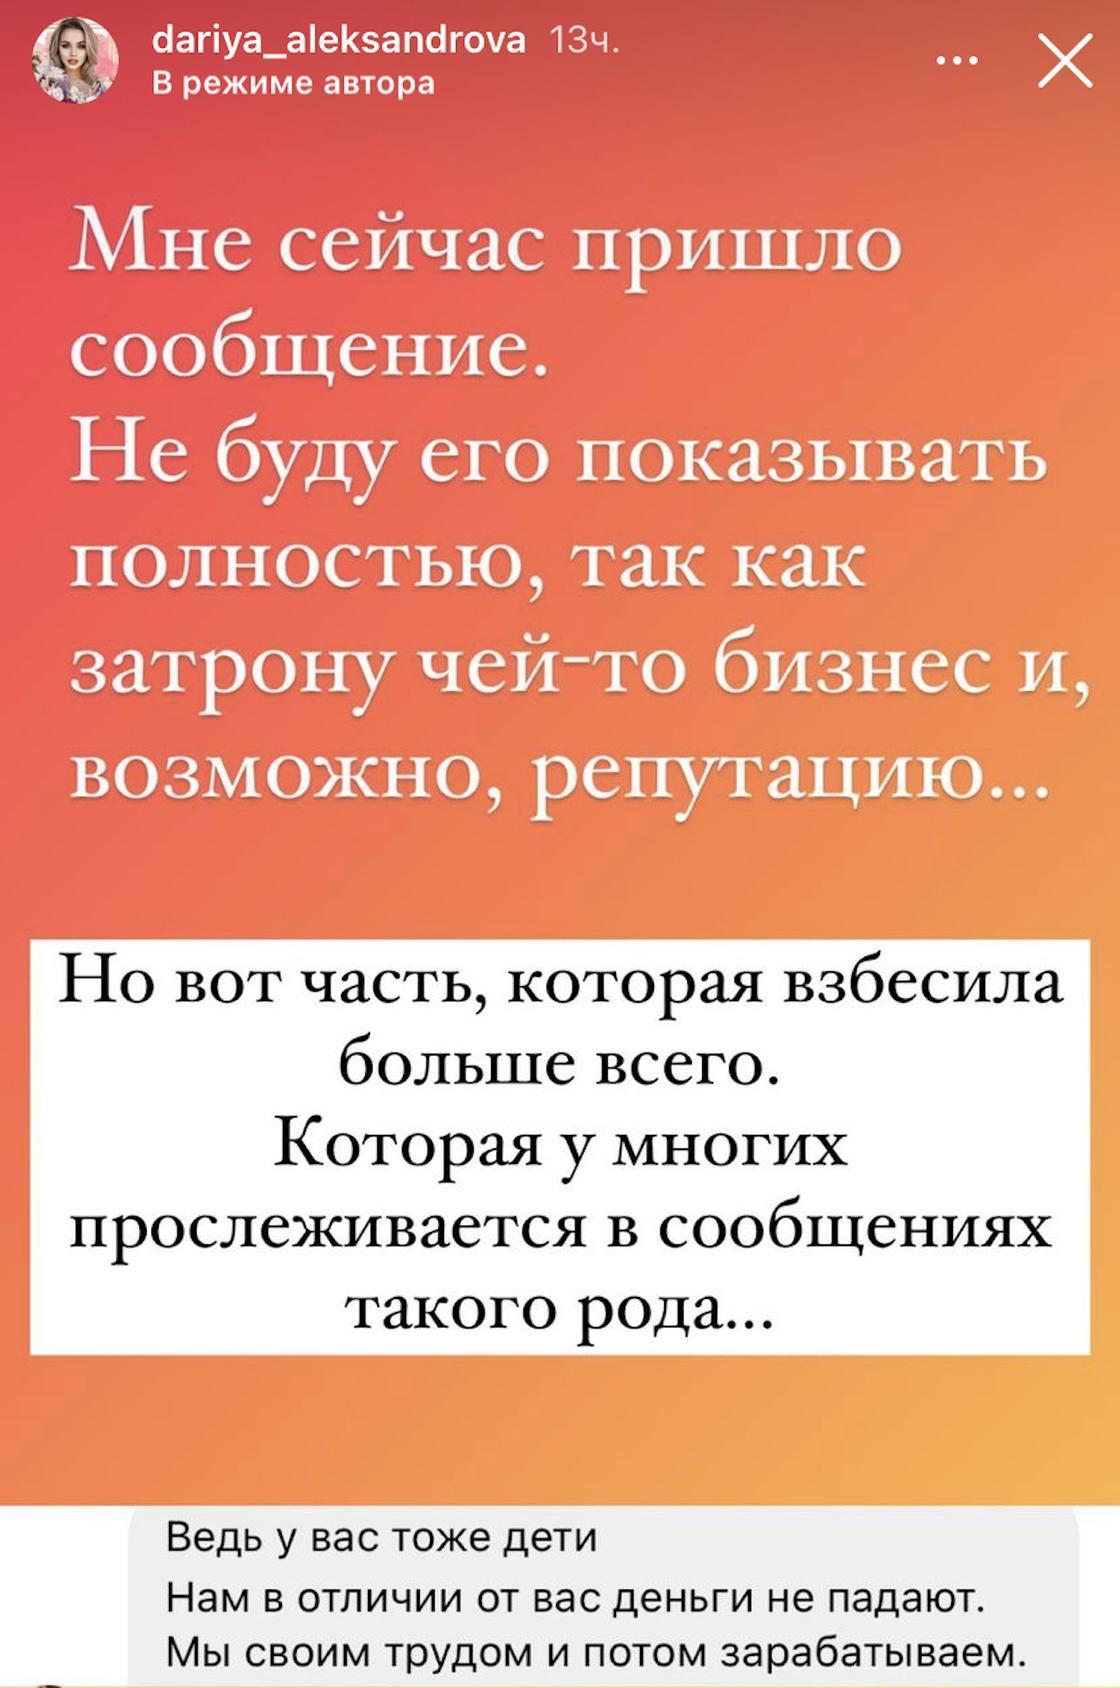 Stories Дарьи Александровой